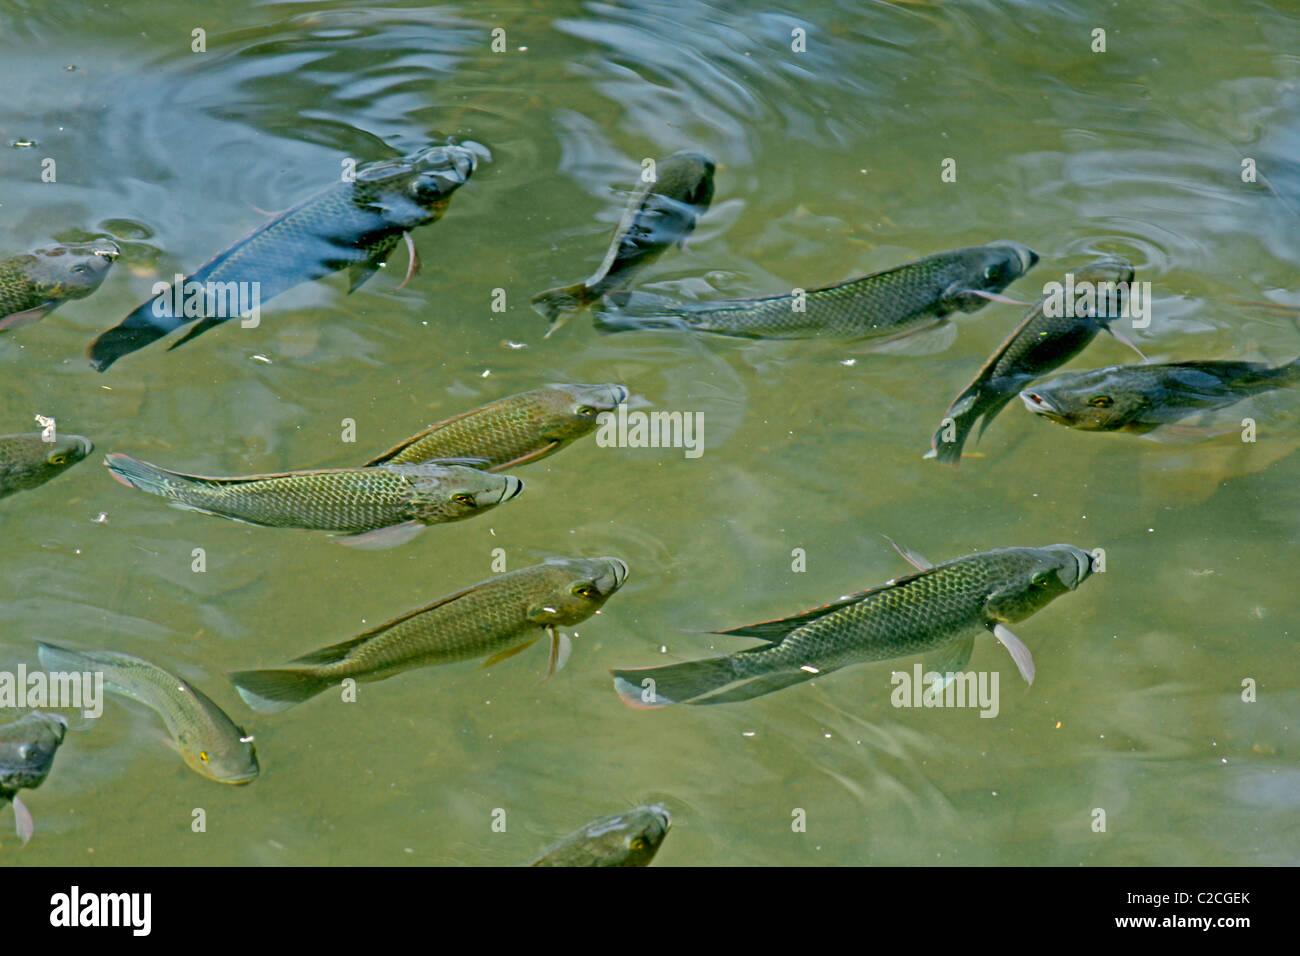 Blue Kurper Mozambique Tilapia Oreochromis Mossambicus Fish In Water Pond Pune Maharashtra